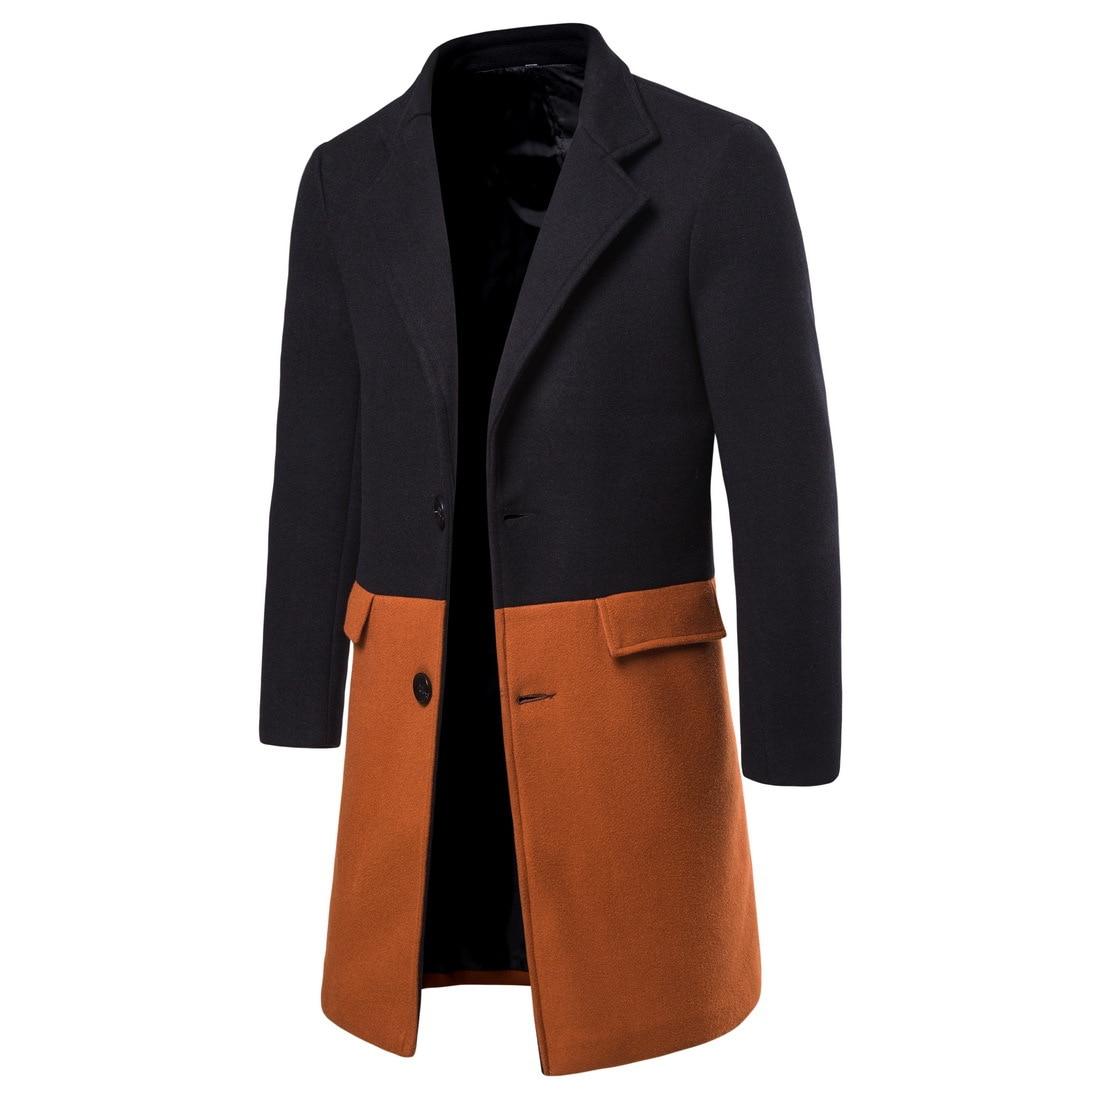 Korean Autumn Men'S Coat Mandarin Collar Long Sleeve Winter Coat Men Patchwork Overcoat Men Casual Long Jacket Abrigo Hombre